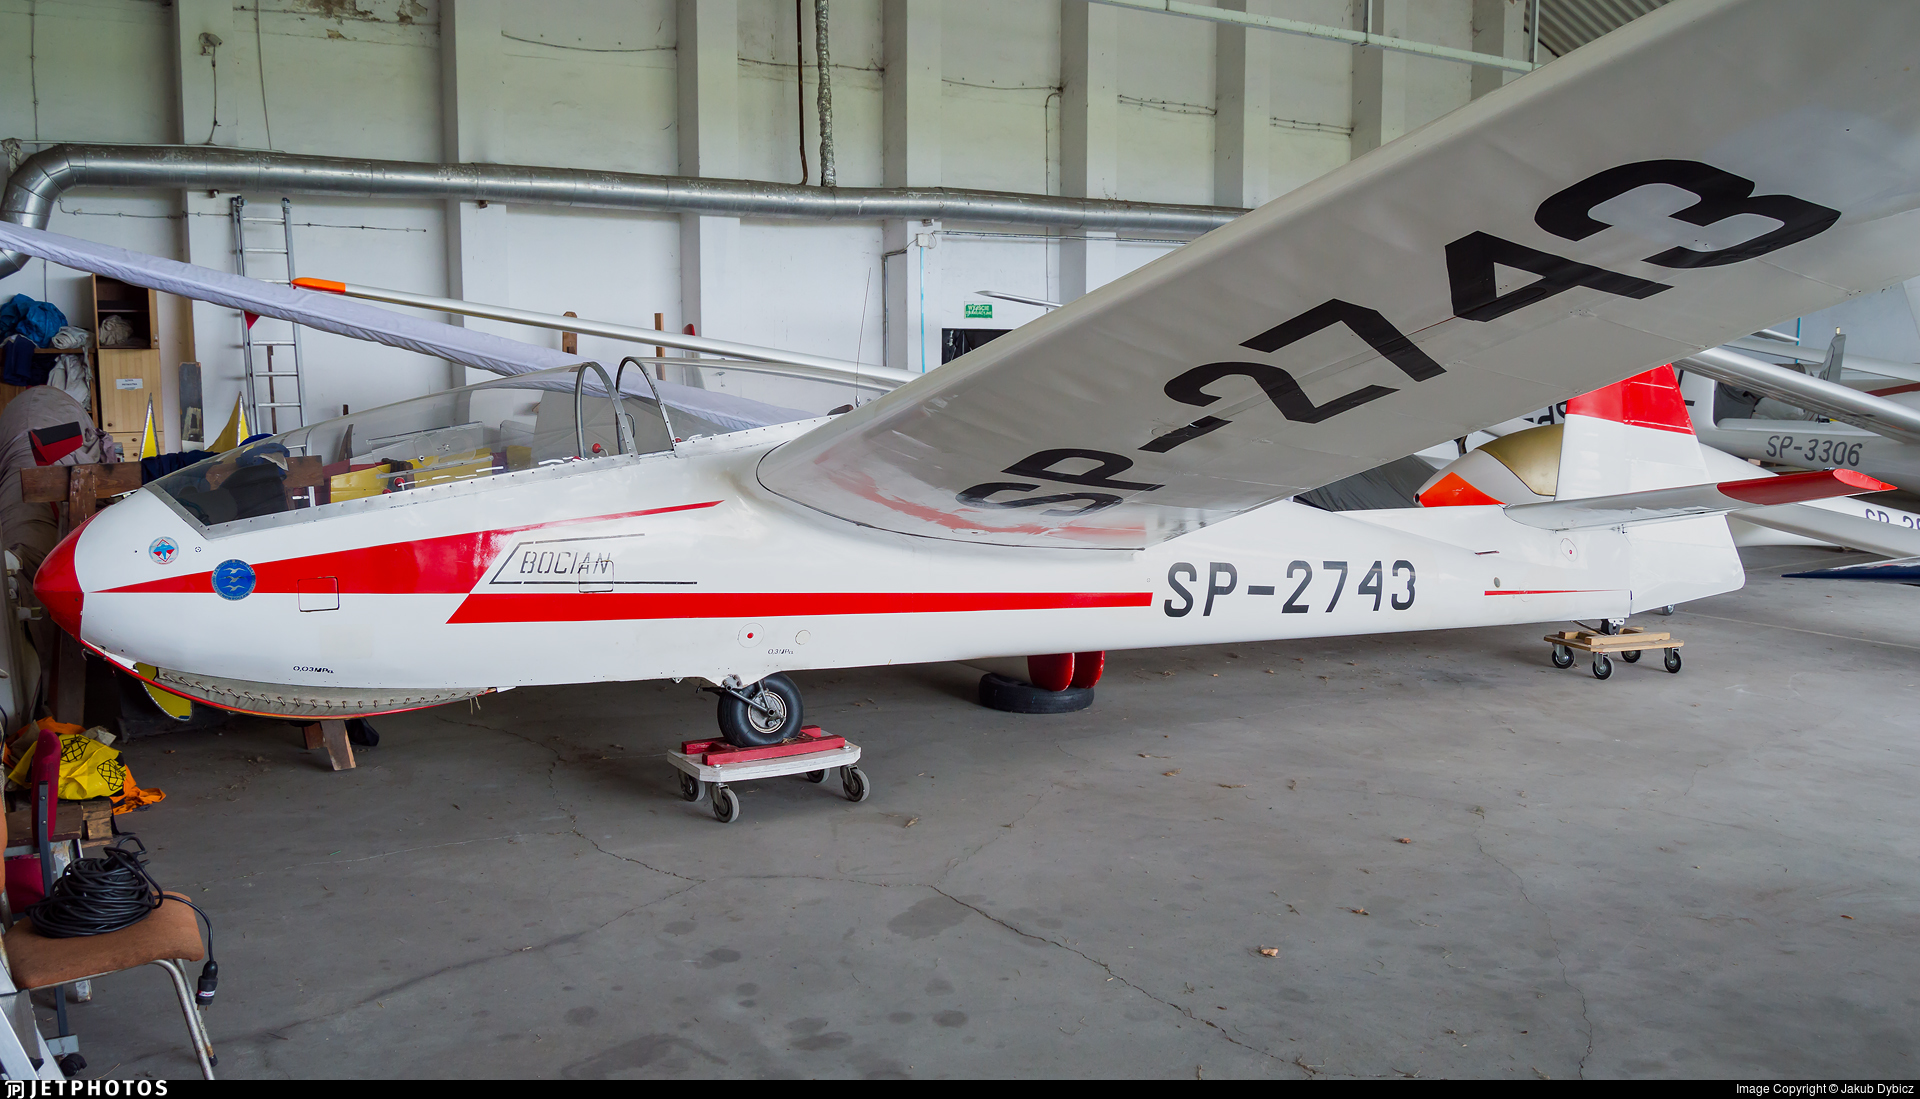 SP-2743 - SZD 9bis Bocian 1E - Aero - Club Kujawski